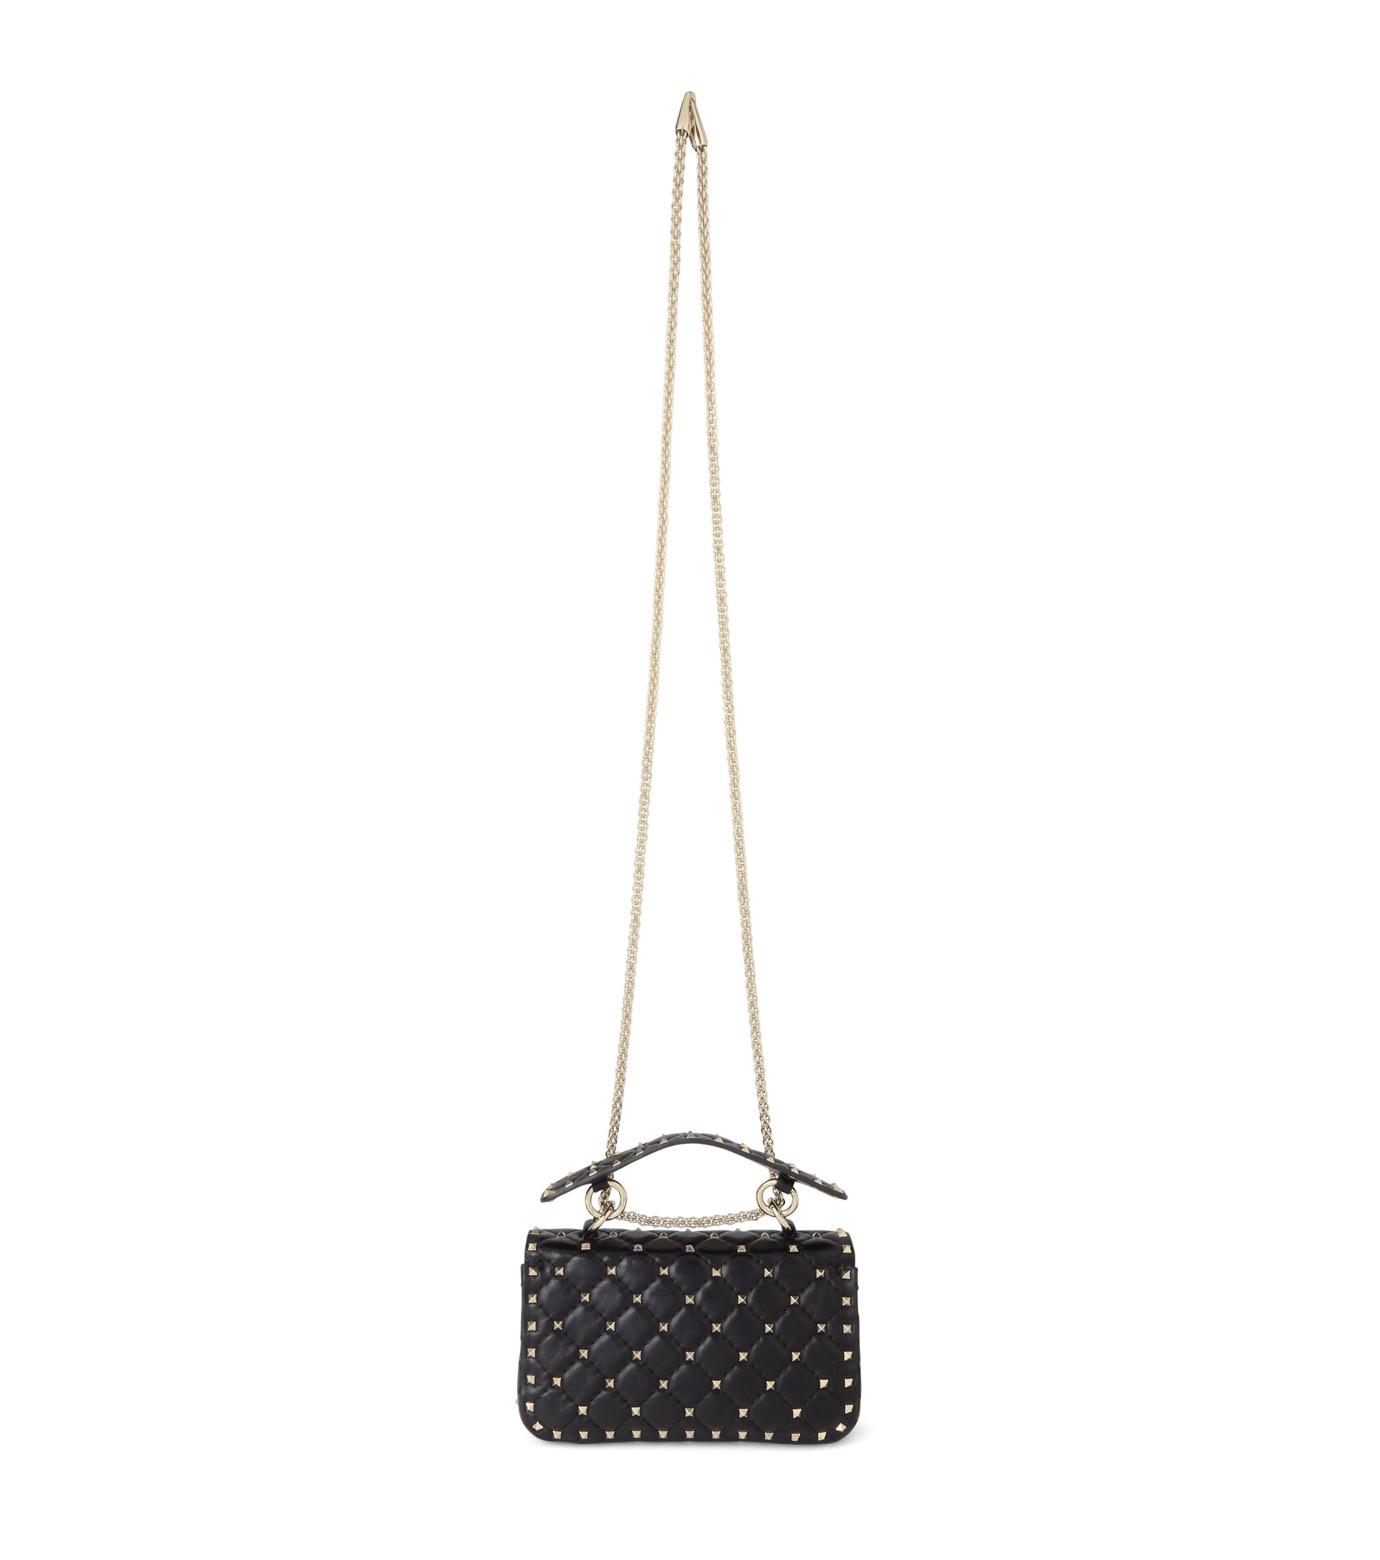 VALENTINO GARAVANI(ヴァレンティノ ガラヴァーニ)のRockstud Matelasse Small-BLACK(ショルダーバッグ/shoulder bag)-LW0B0123NAP-13 拡大詳細画像3